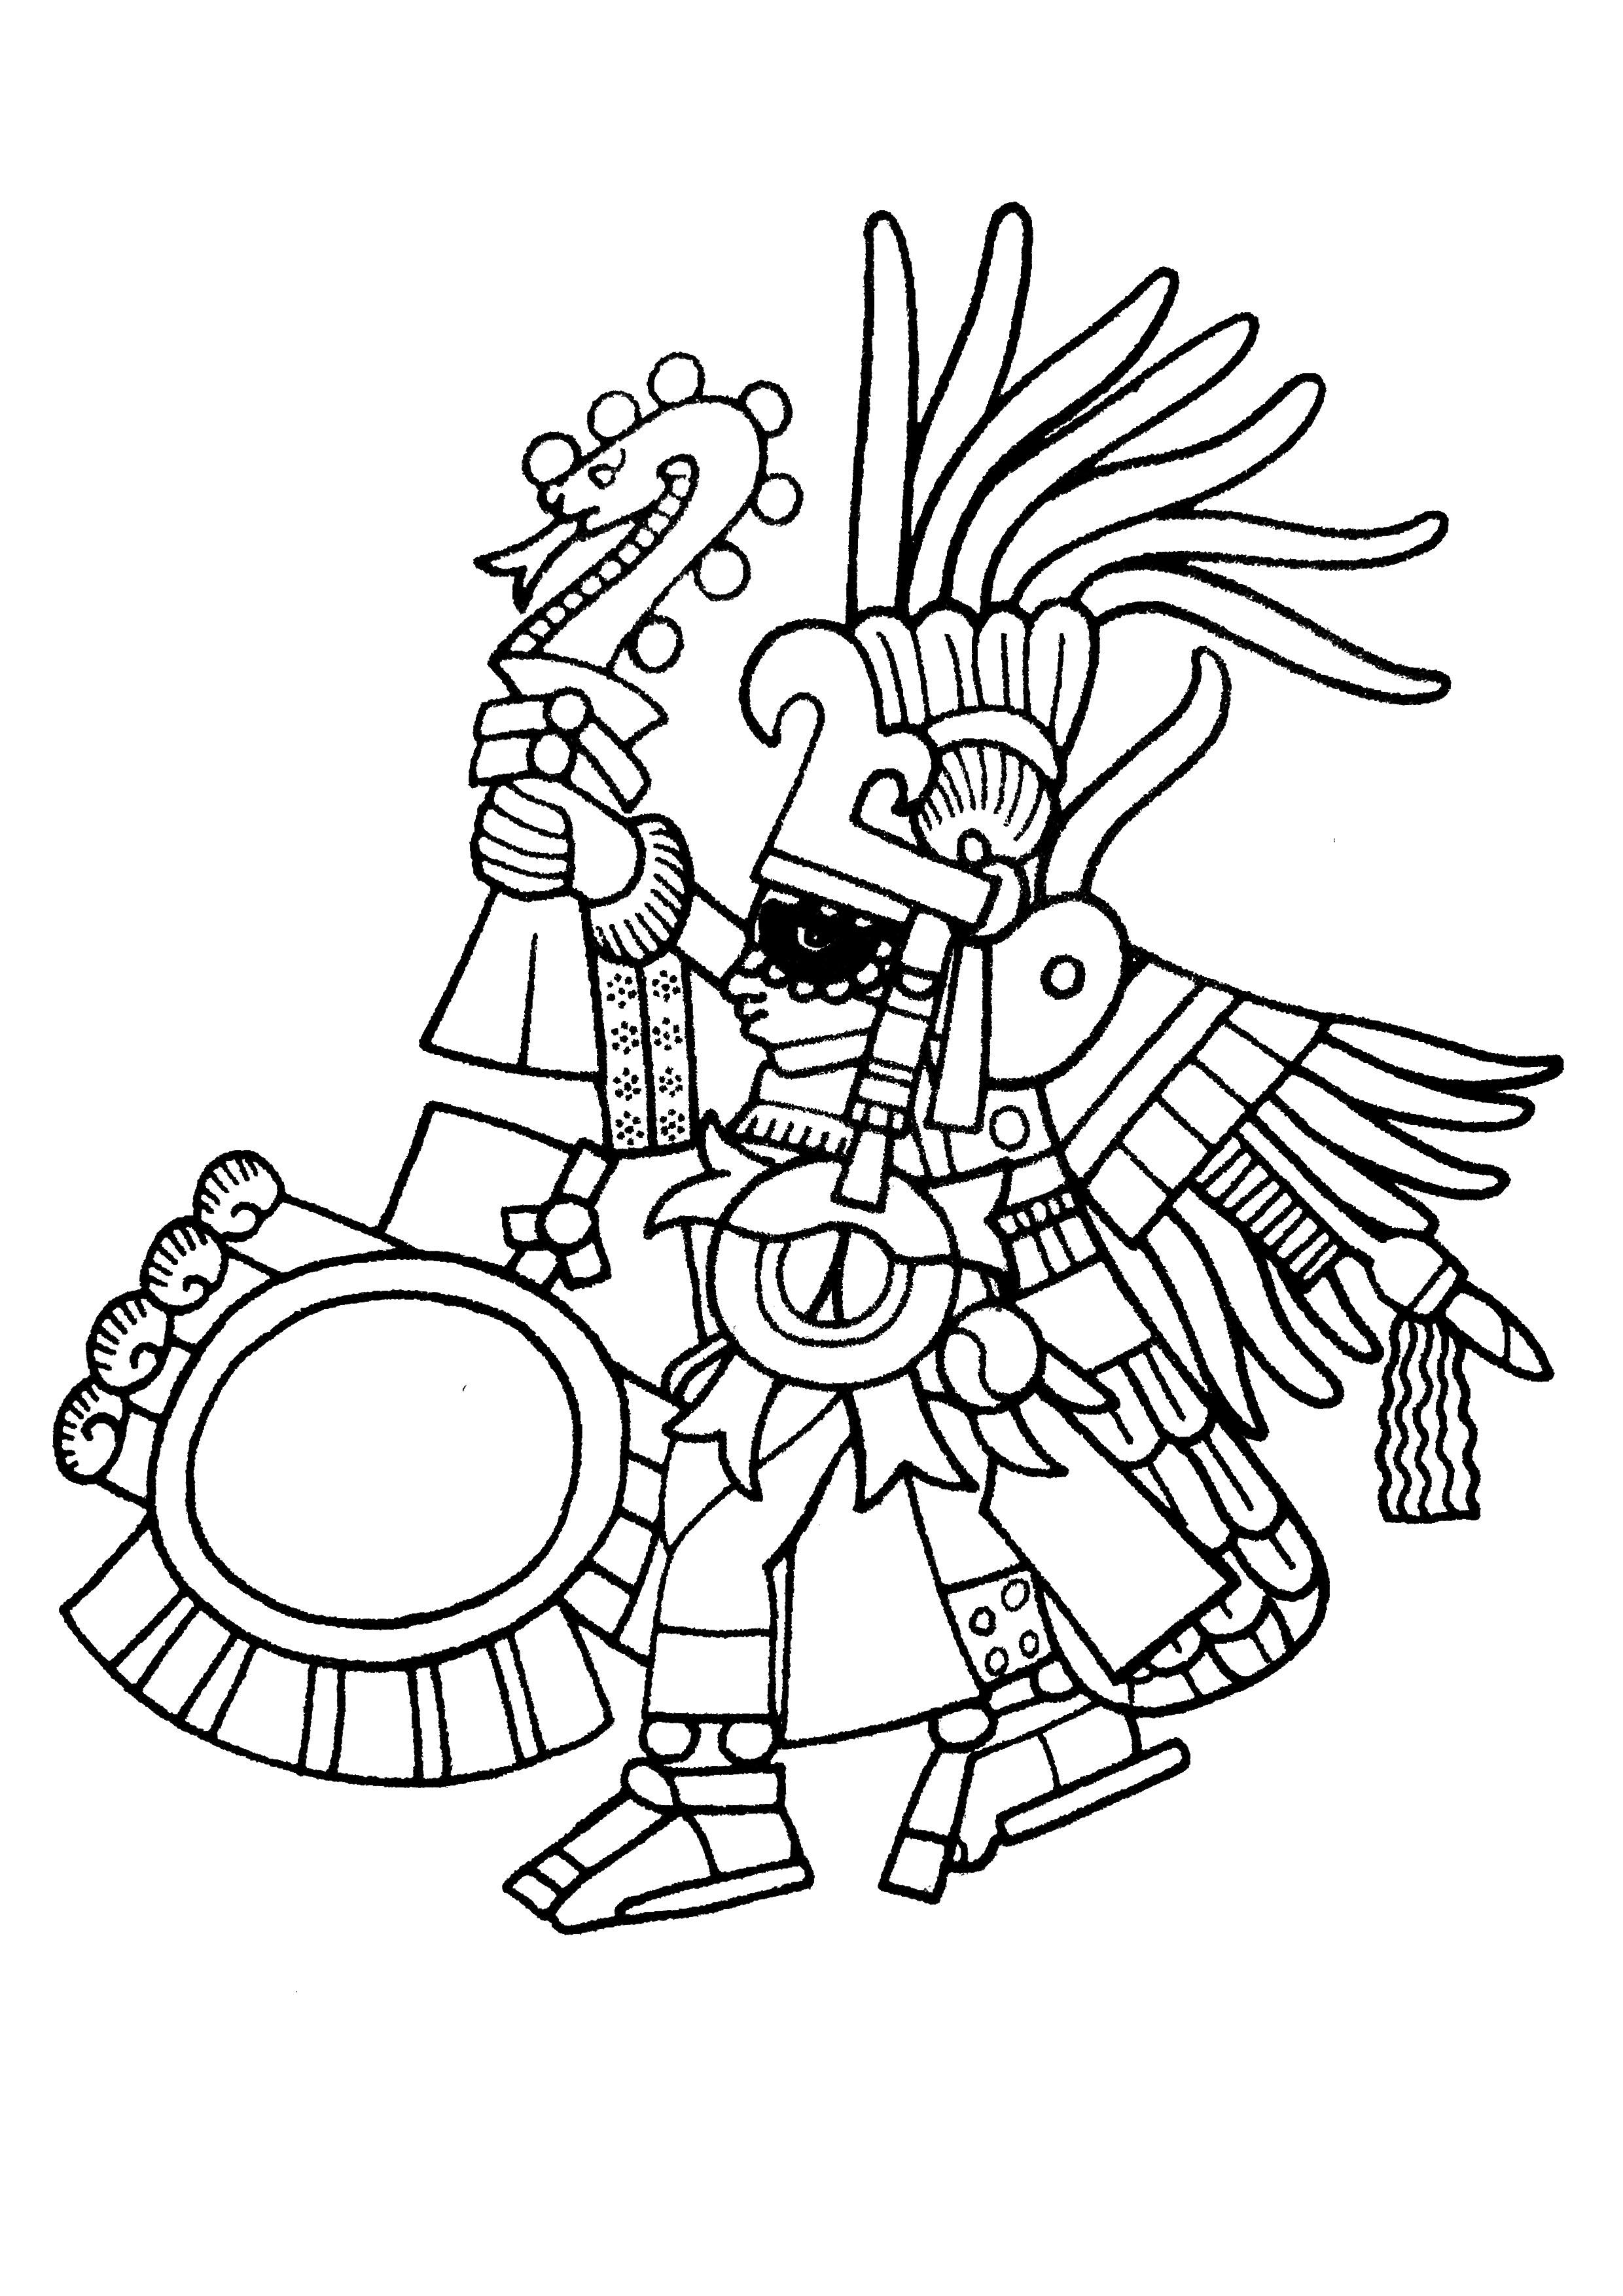 Huitzilopochtli, Dieu Aztèque de la Guerre, brandissant un bâton à l'effigie de Xiuhcoatl le 'serpent de feu'